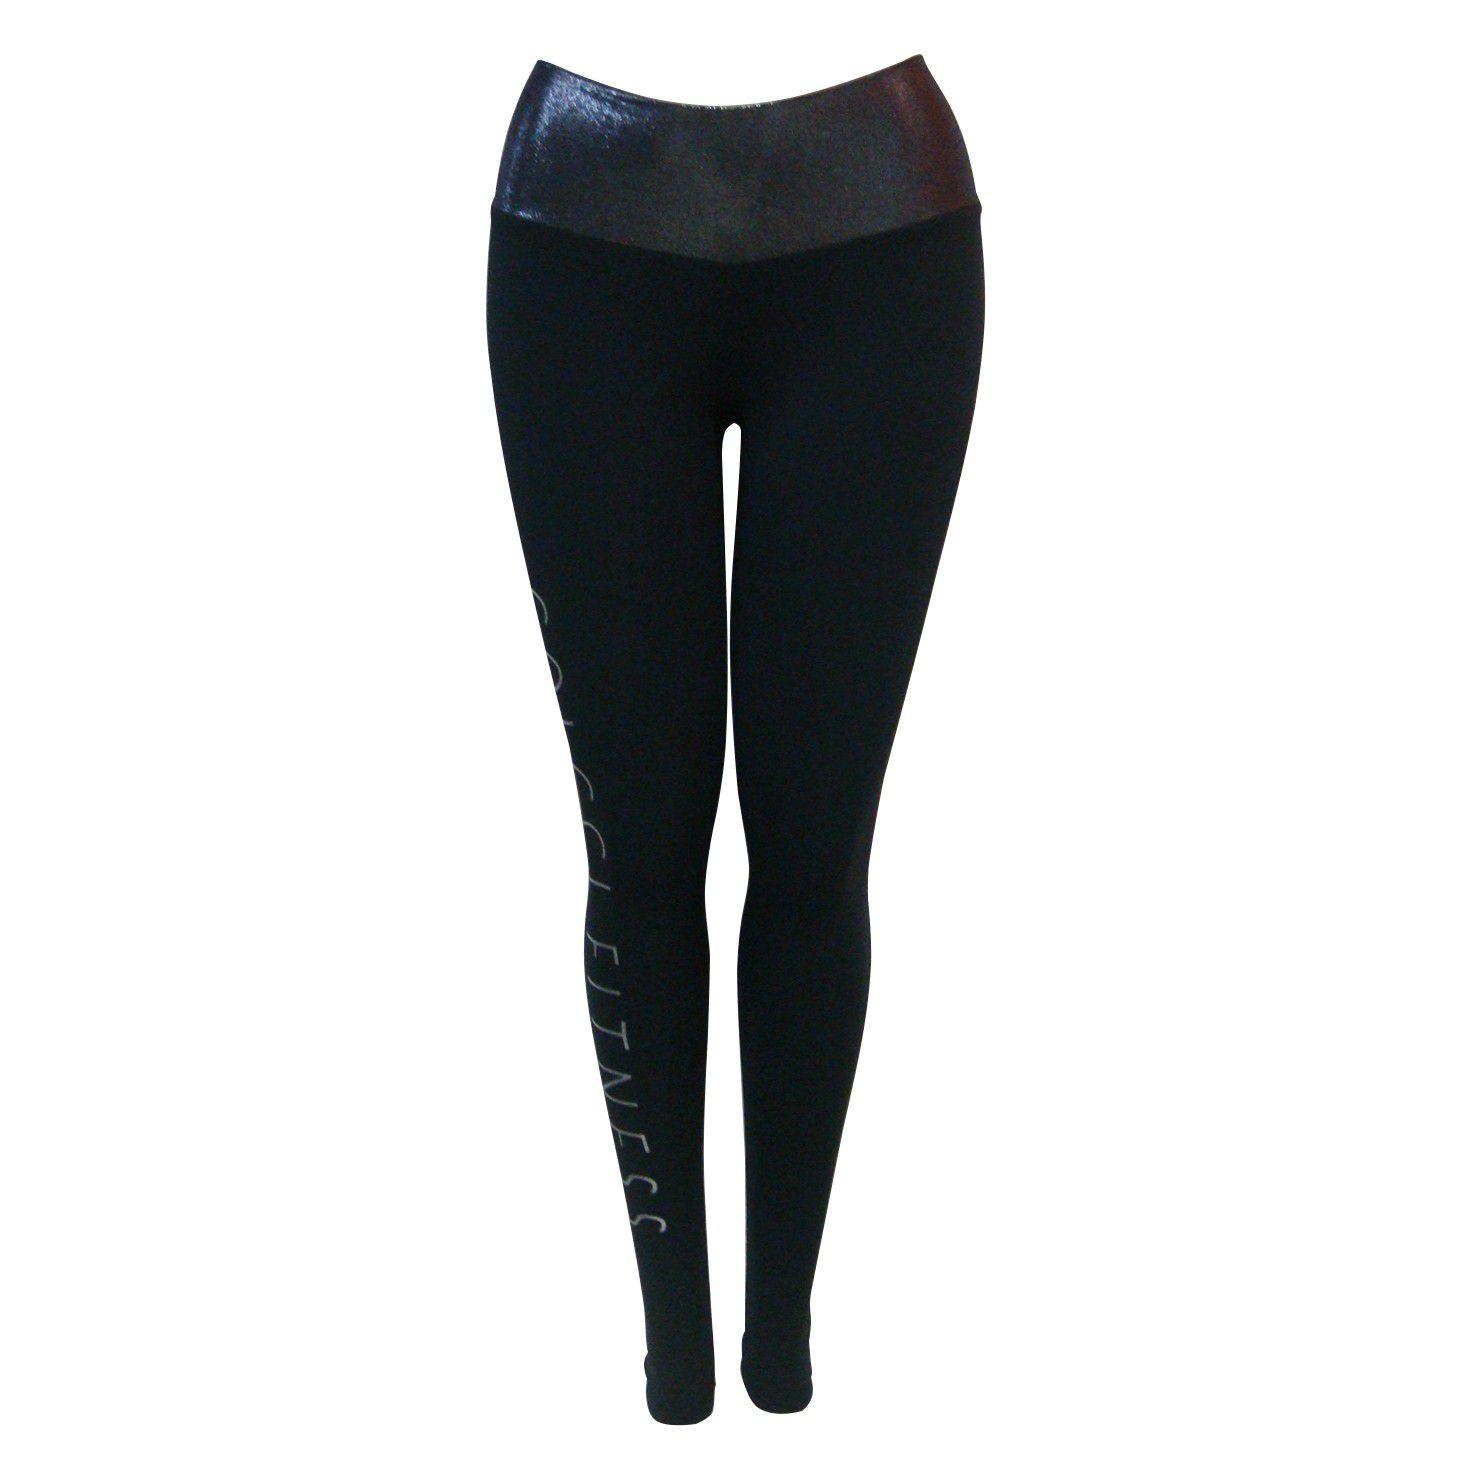 Calça Legging Colcci Fitness Estampada Feminina